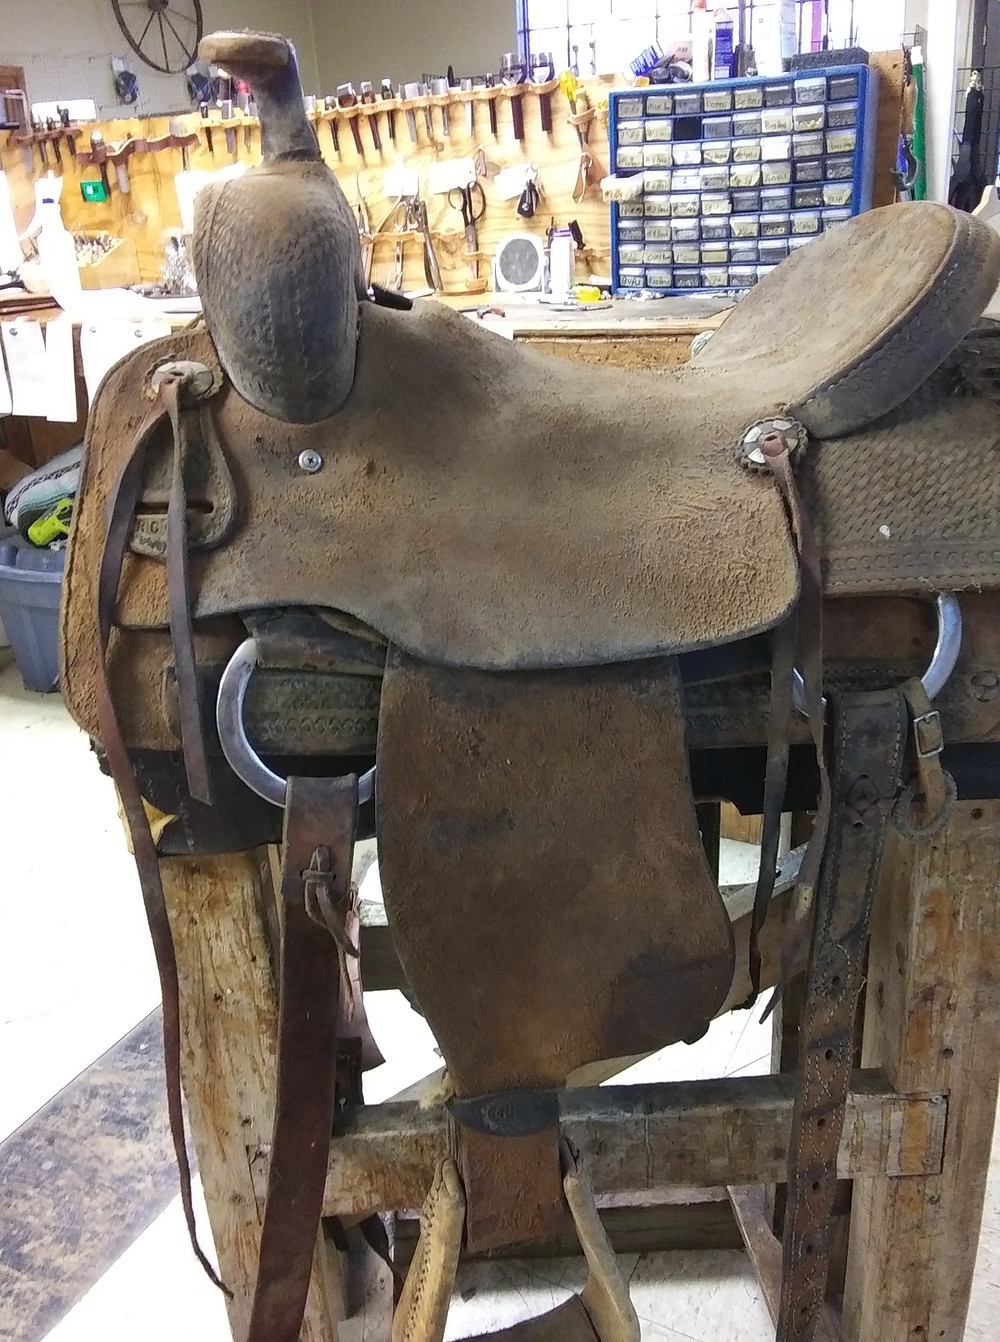 Leather Repair in Central Arkansas